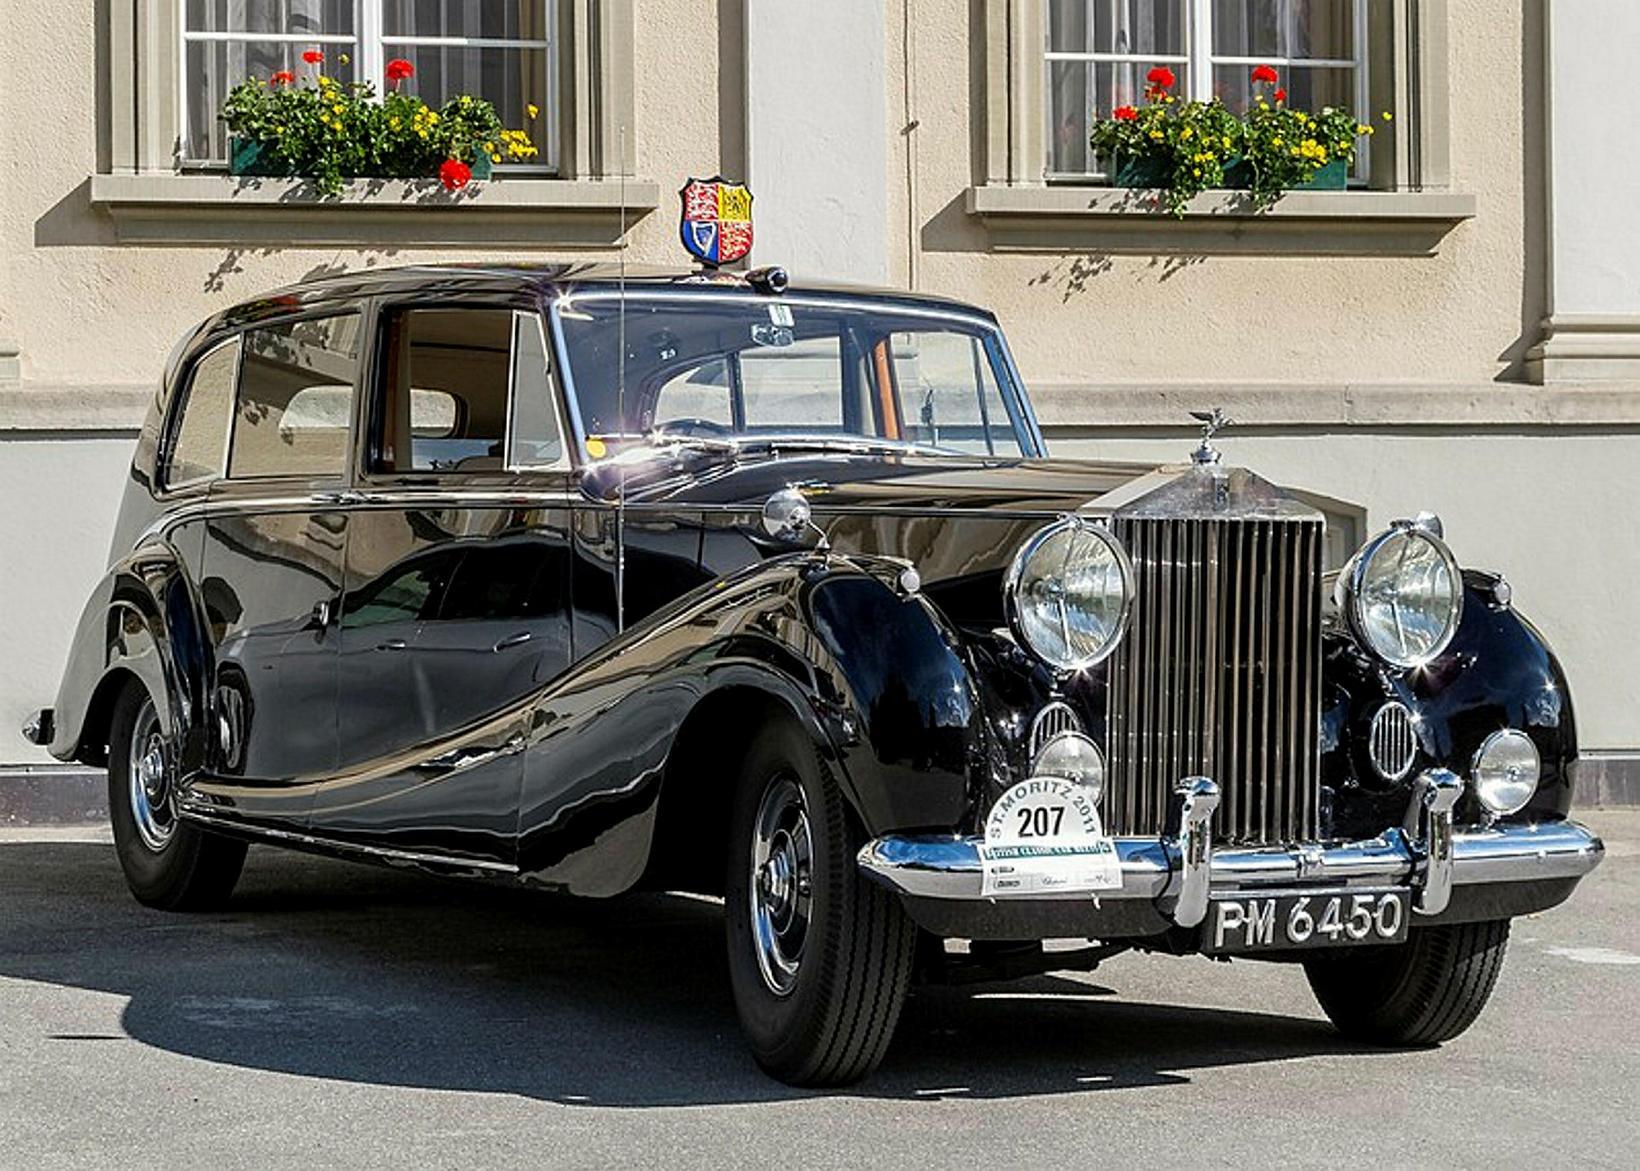 Rolls Royce Phantom IV úr On Her Majesty's Secret Service.